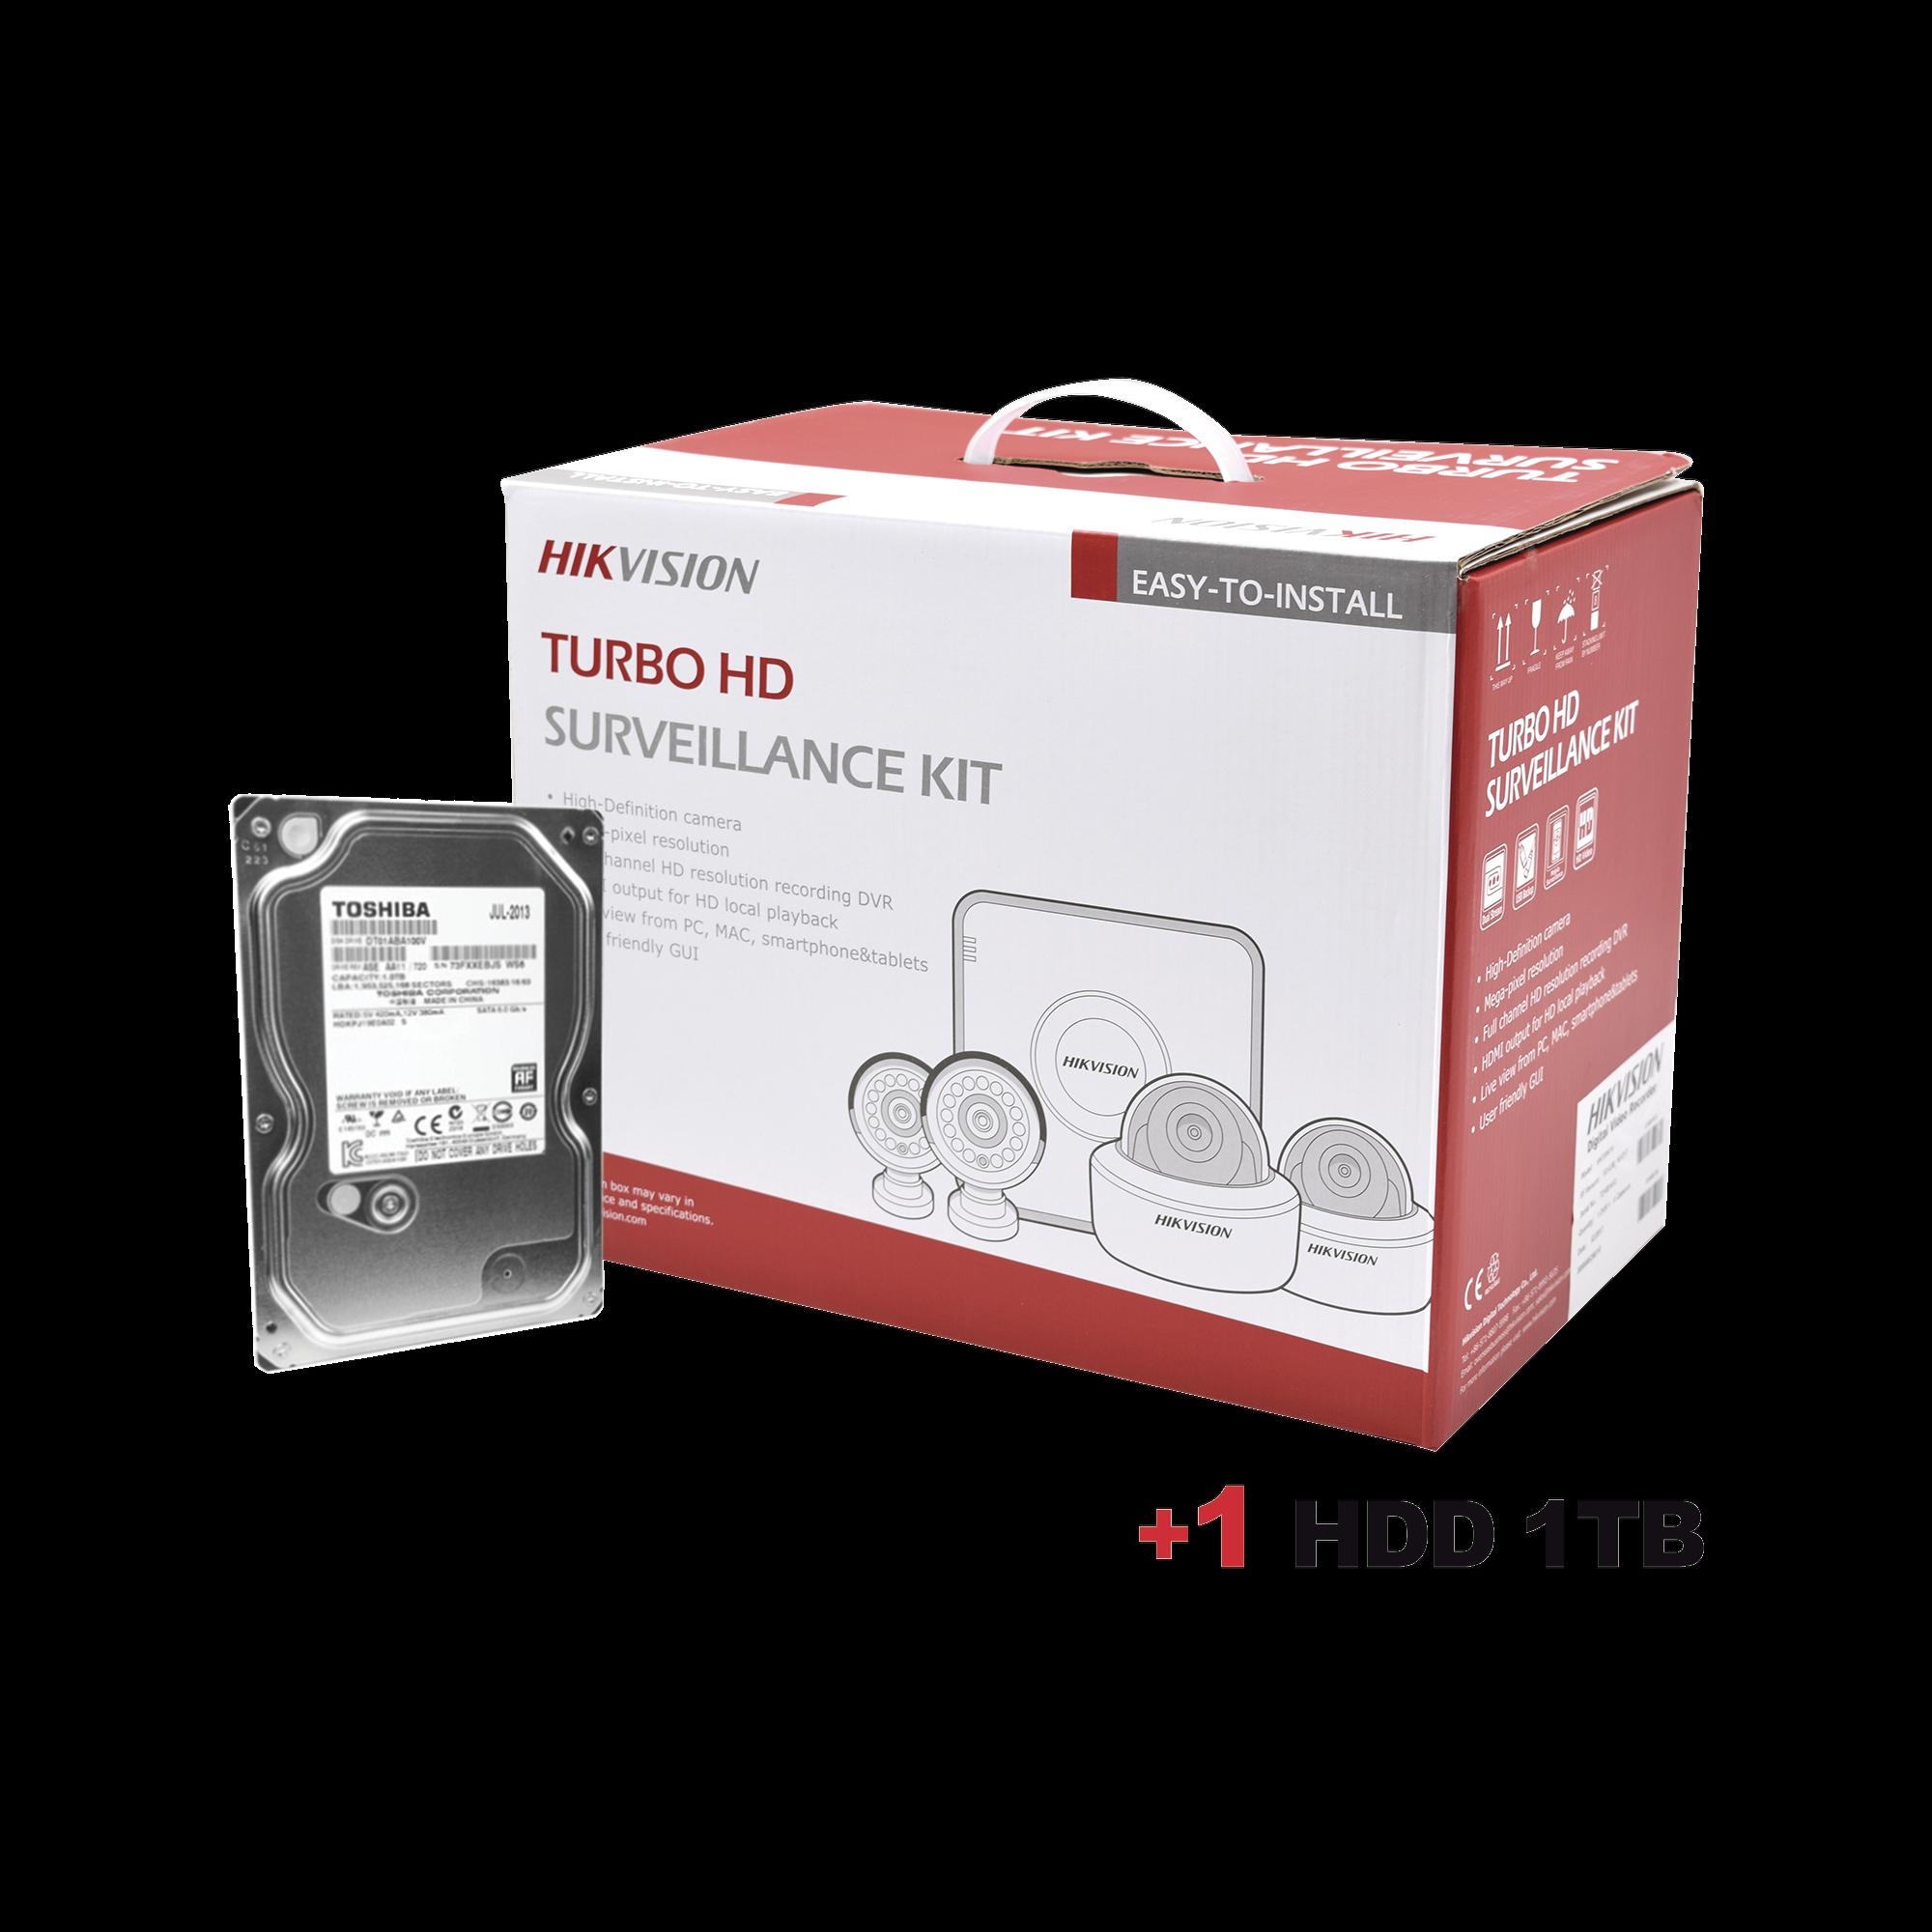 Disco duro 1 TB + Sistema Completo de CCTV 720p / Hik-Connect / DVR 4 Canales / 4 Camaras Bala / Cables / Fuente de Poder